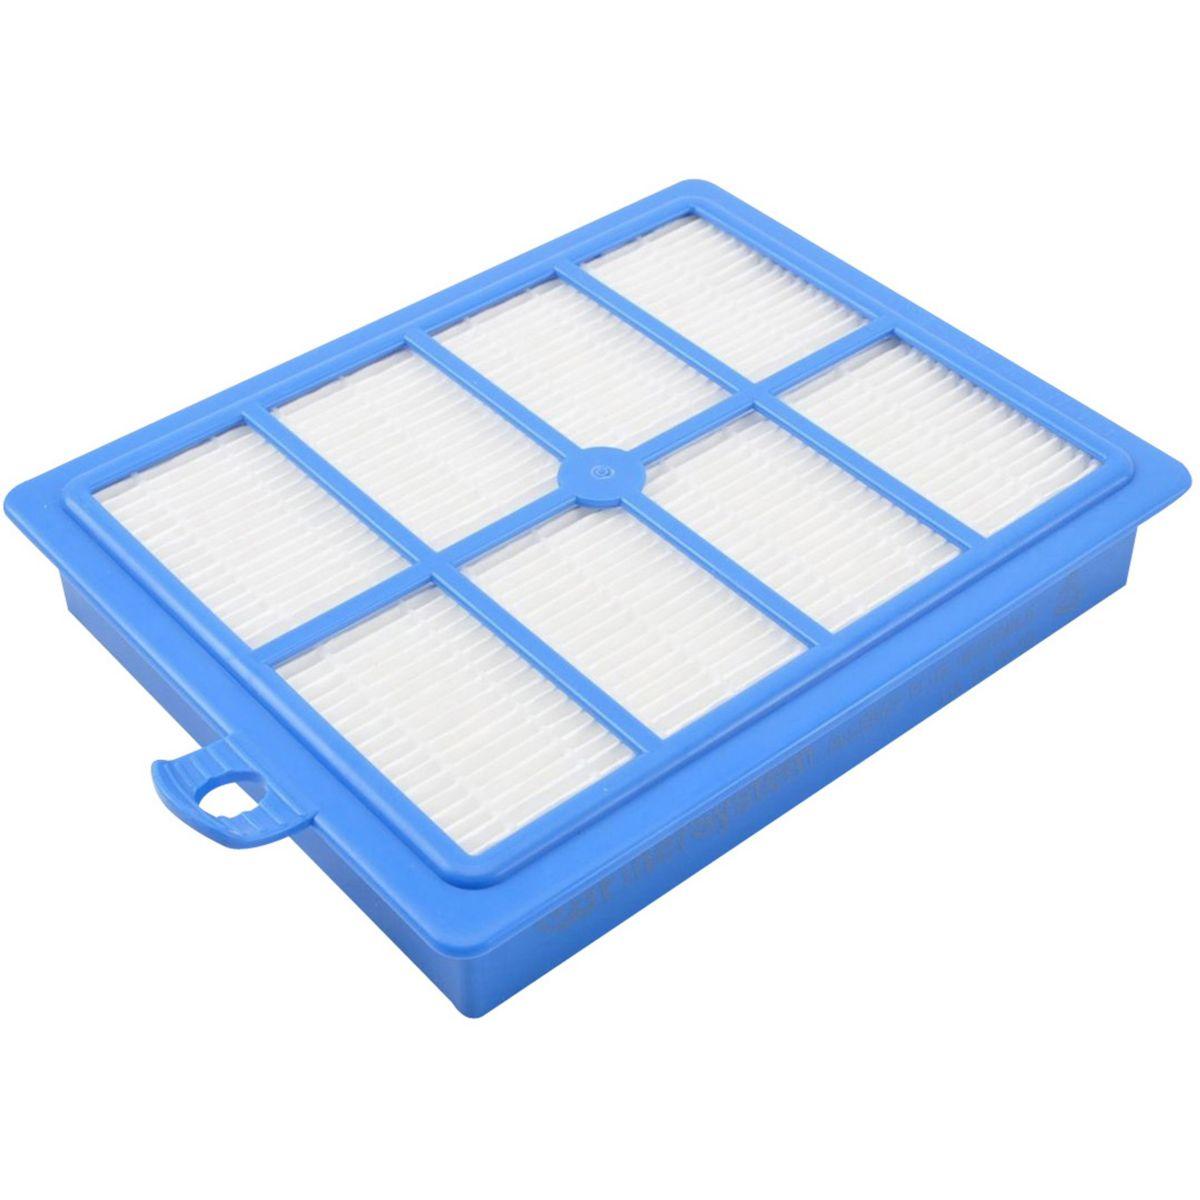 Filtre electrolux filtre efs1w - livraison offerte : code premium (photo)